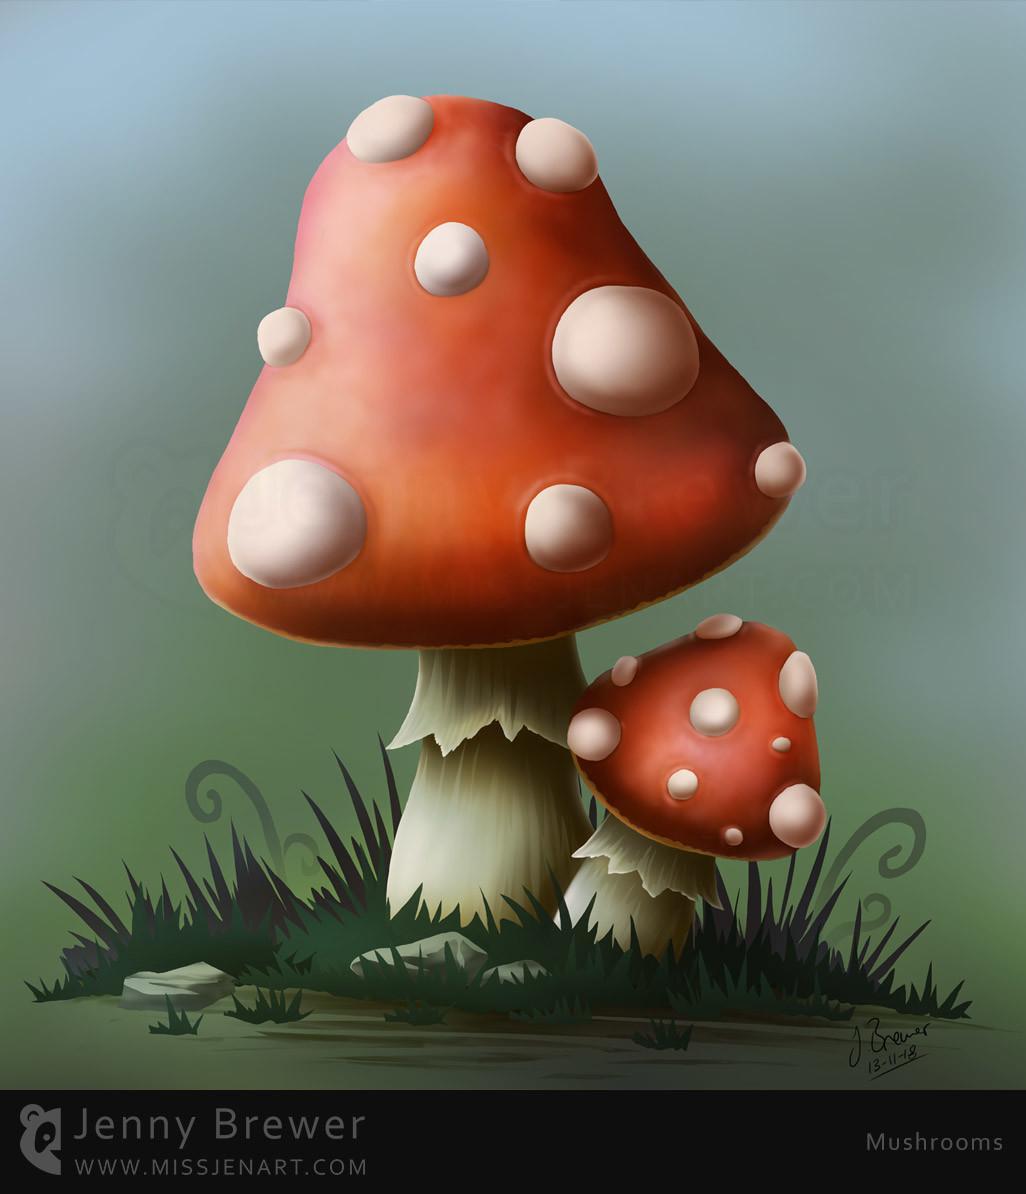 Jenny brewer mushrooms